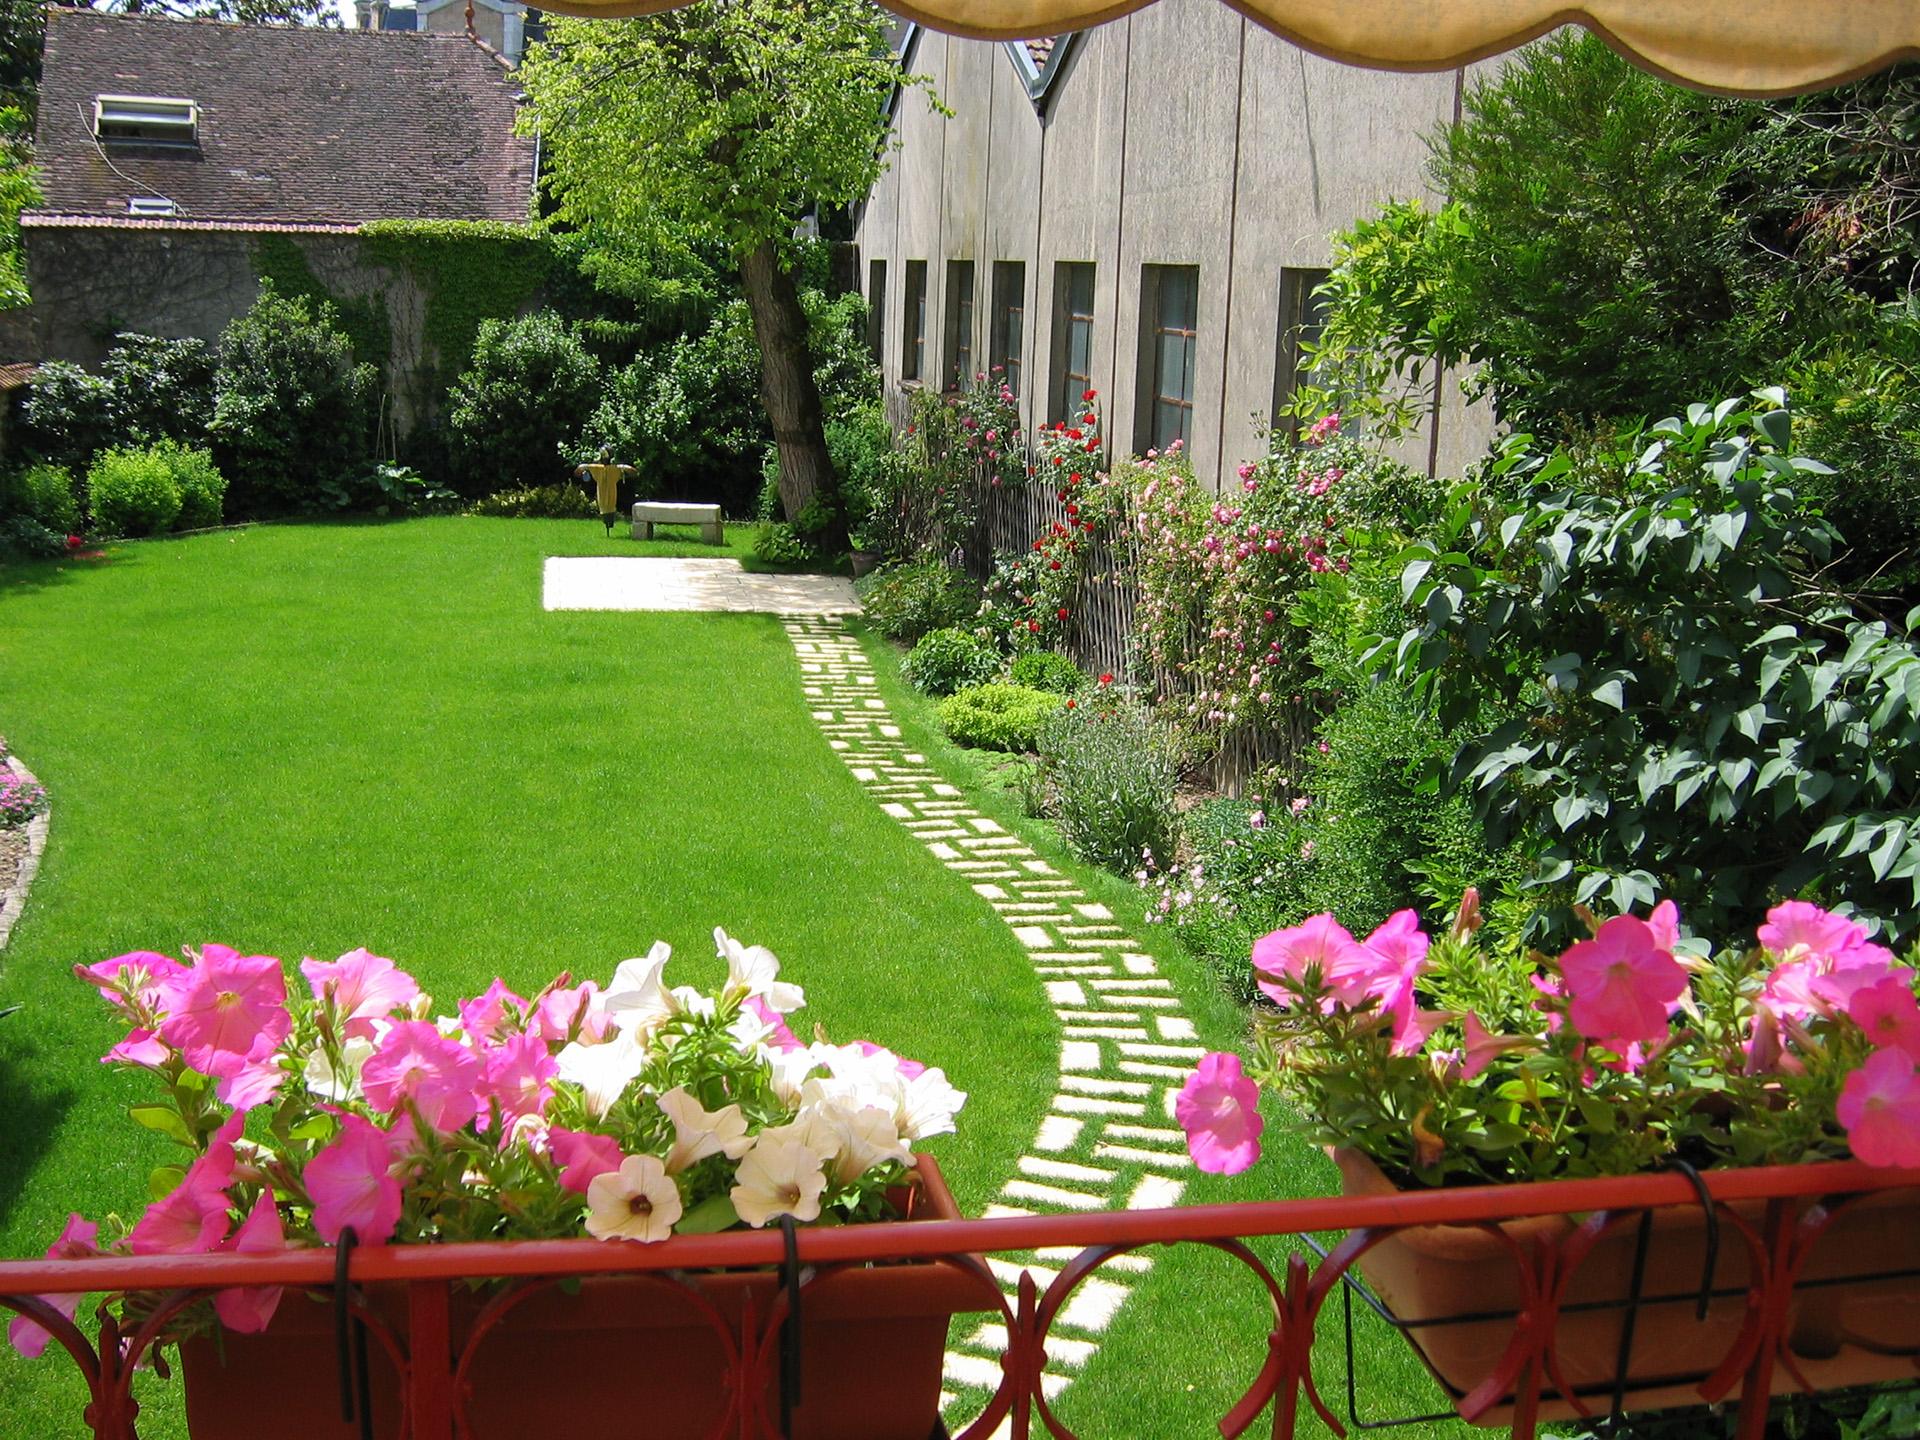 Entreprise entretien jardin montargis amilly sauvegrain for Entreprise entretien jardin 974